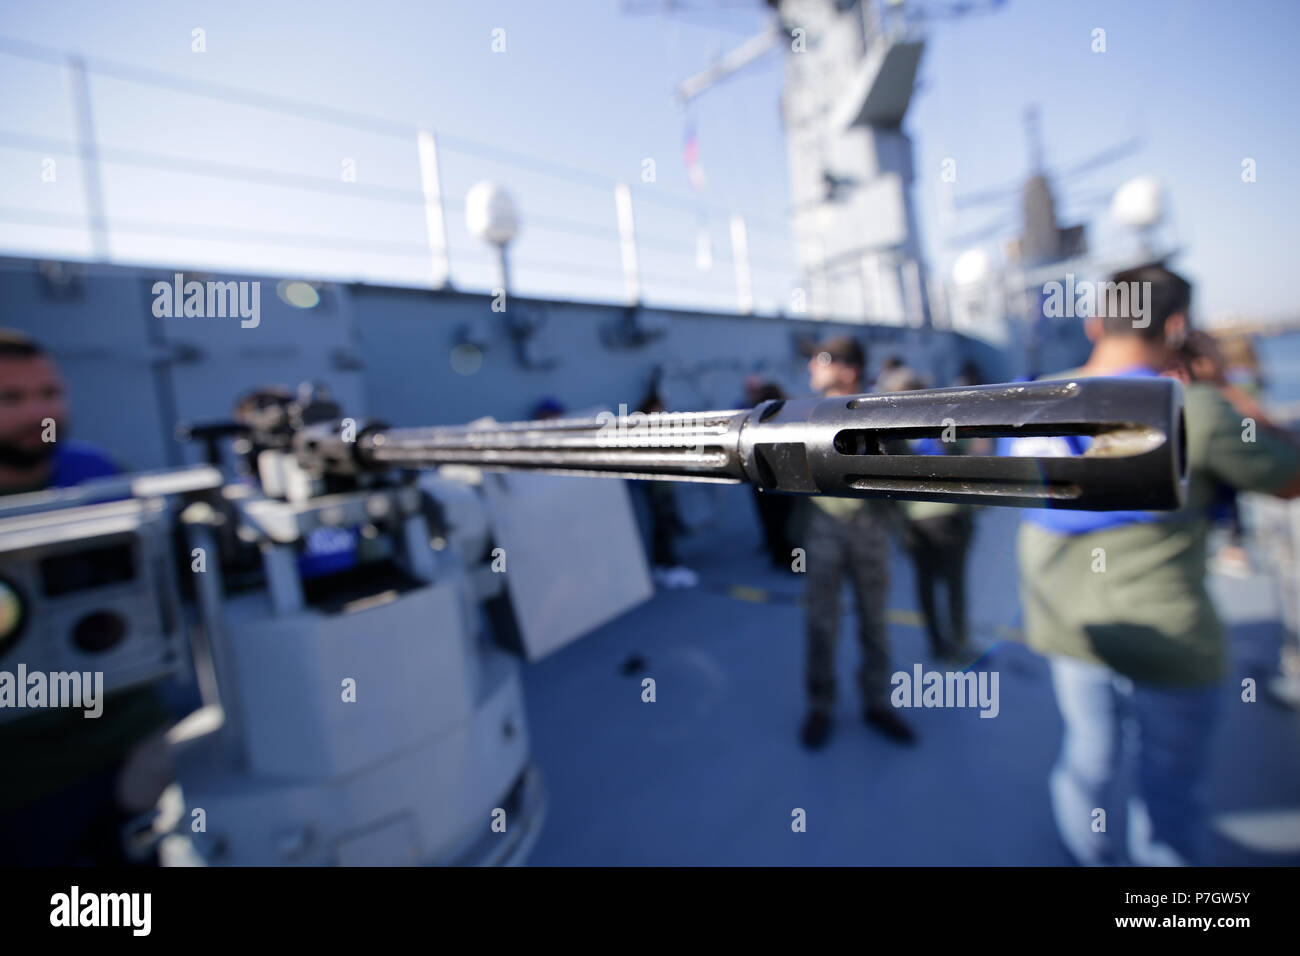 CONSTANTA, ROMANIA - JUNE 20, 2018: Details of the gun barrel of a 50 cal machine gun on June 20. - Stock Image